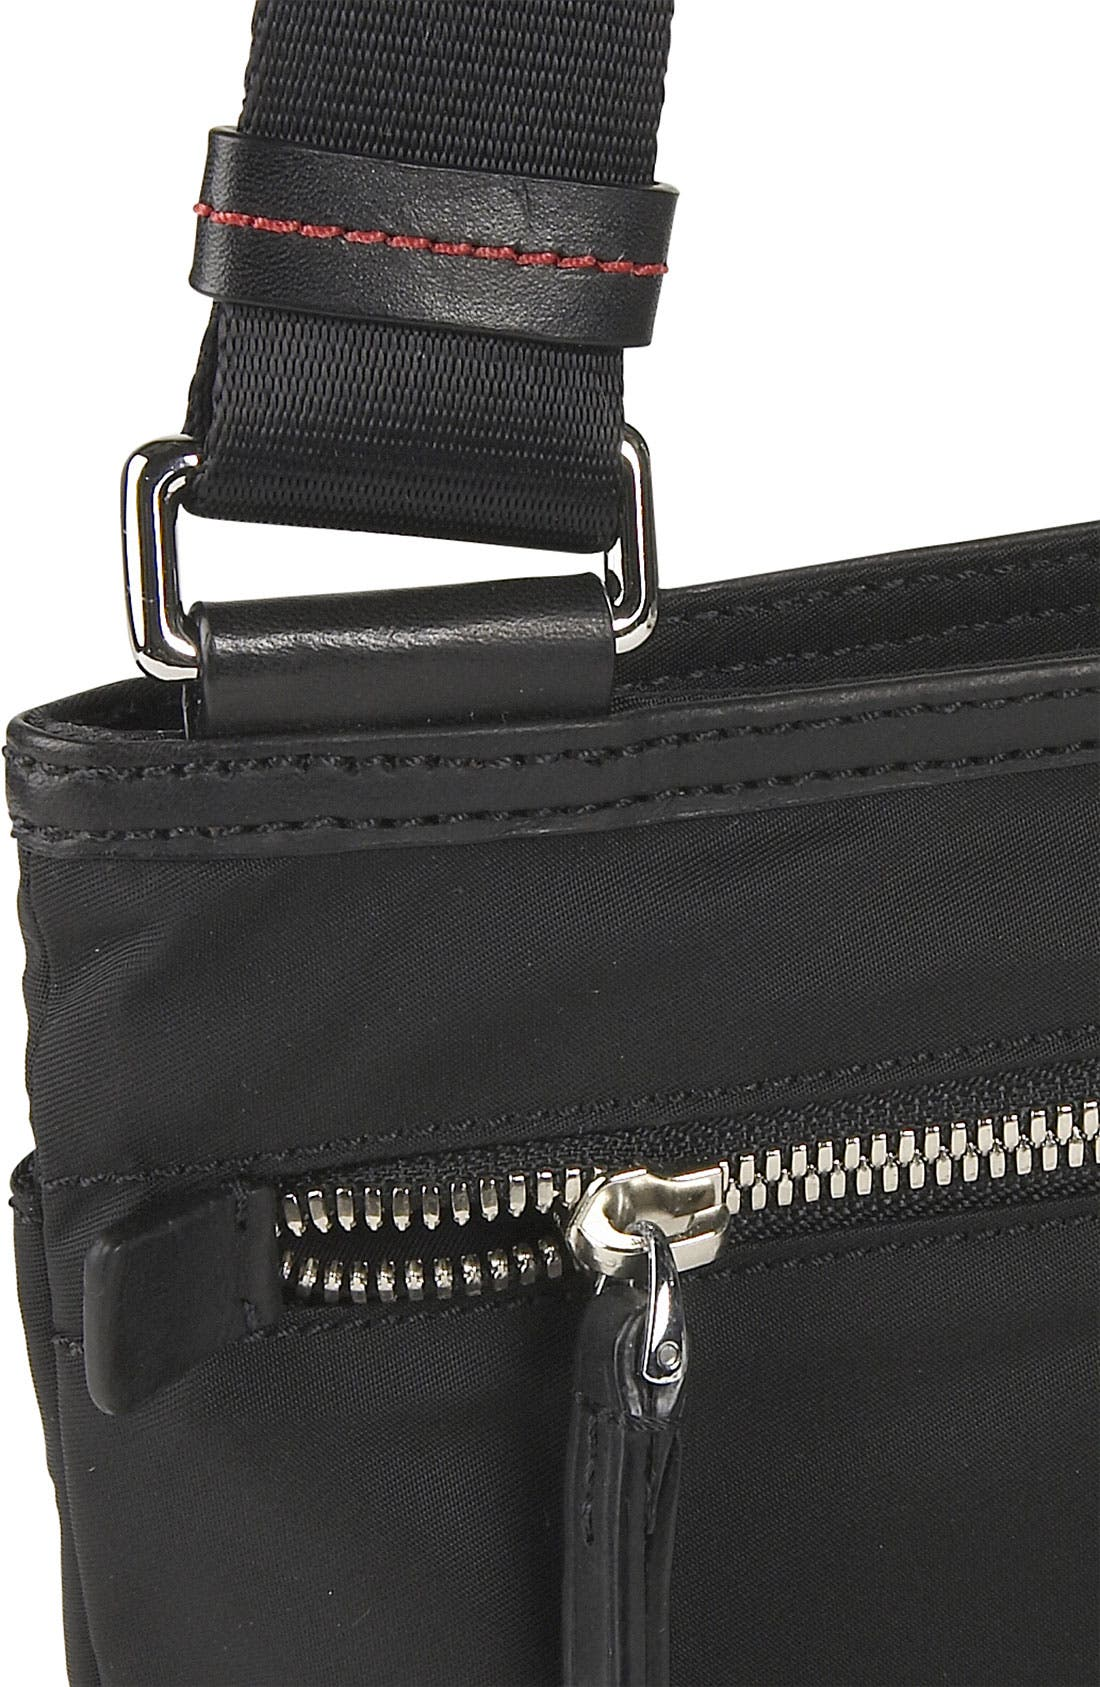 'Voyager - Capri' Crossbody Bag,                             Alternate thumbnail 2, color,                             001